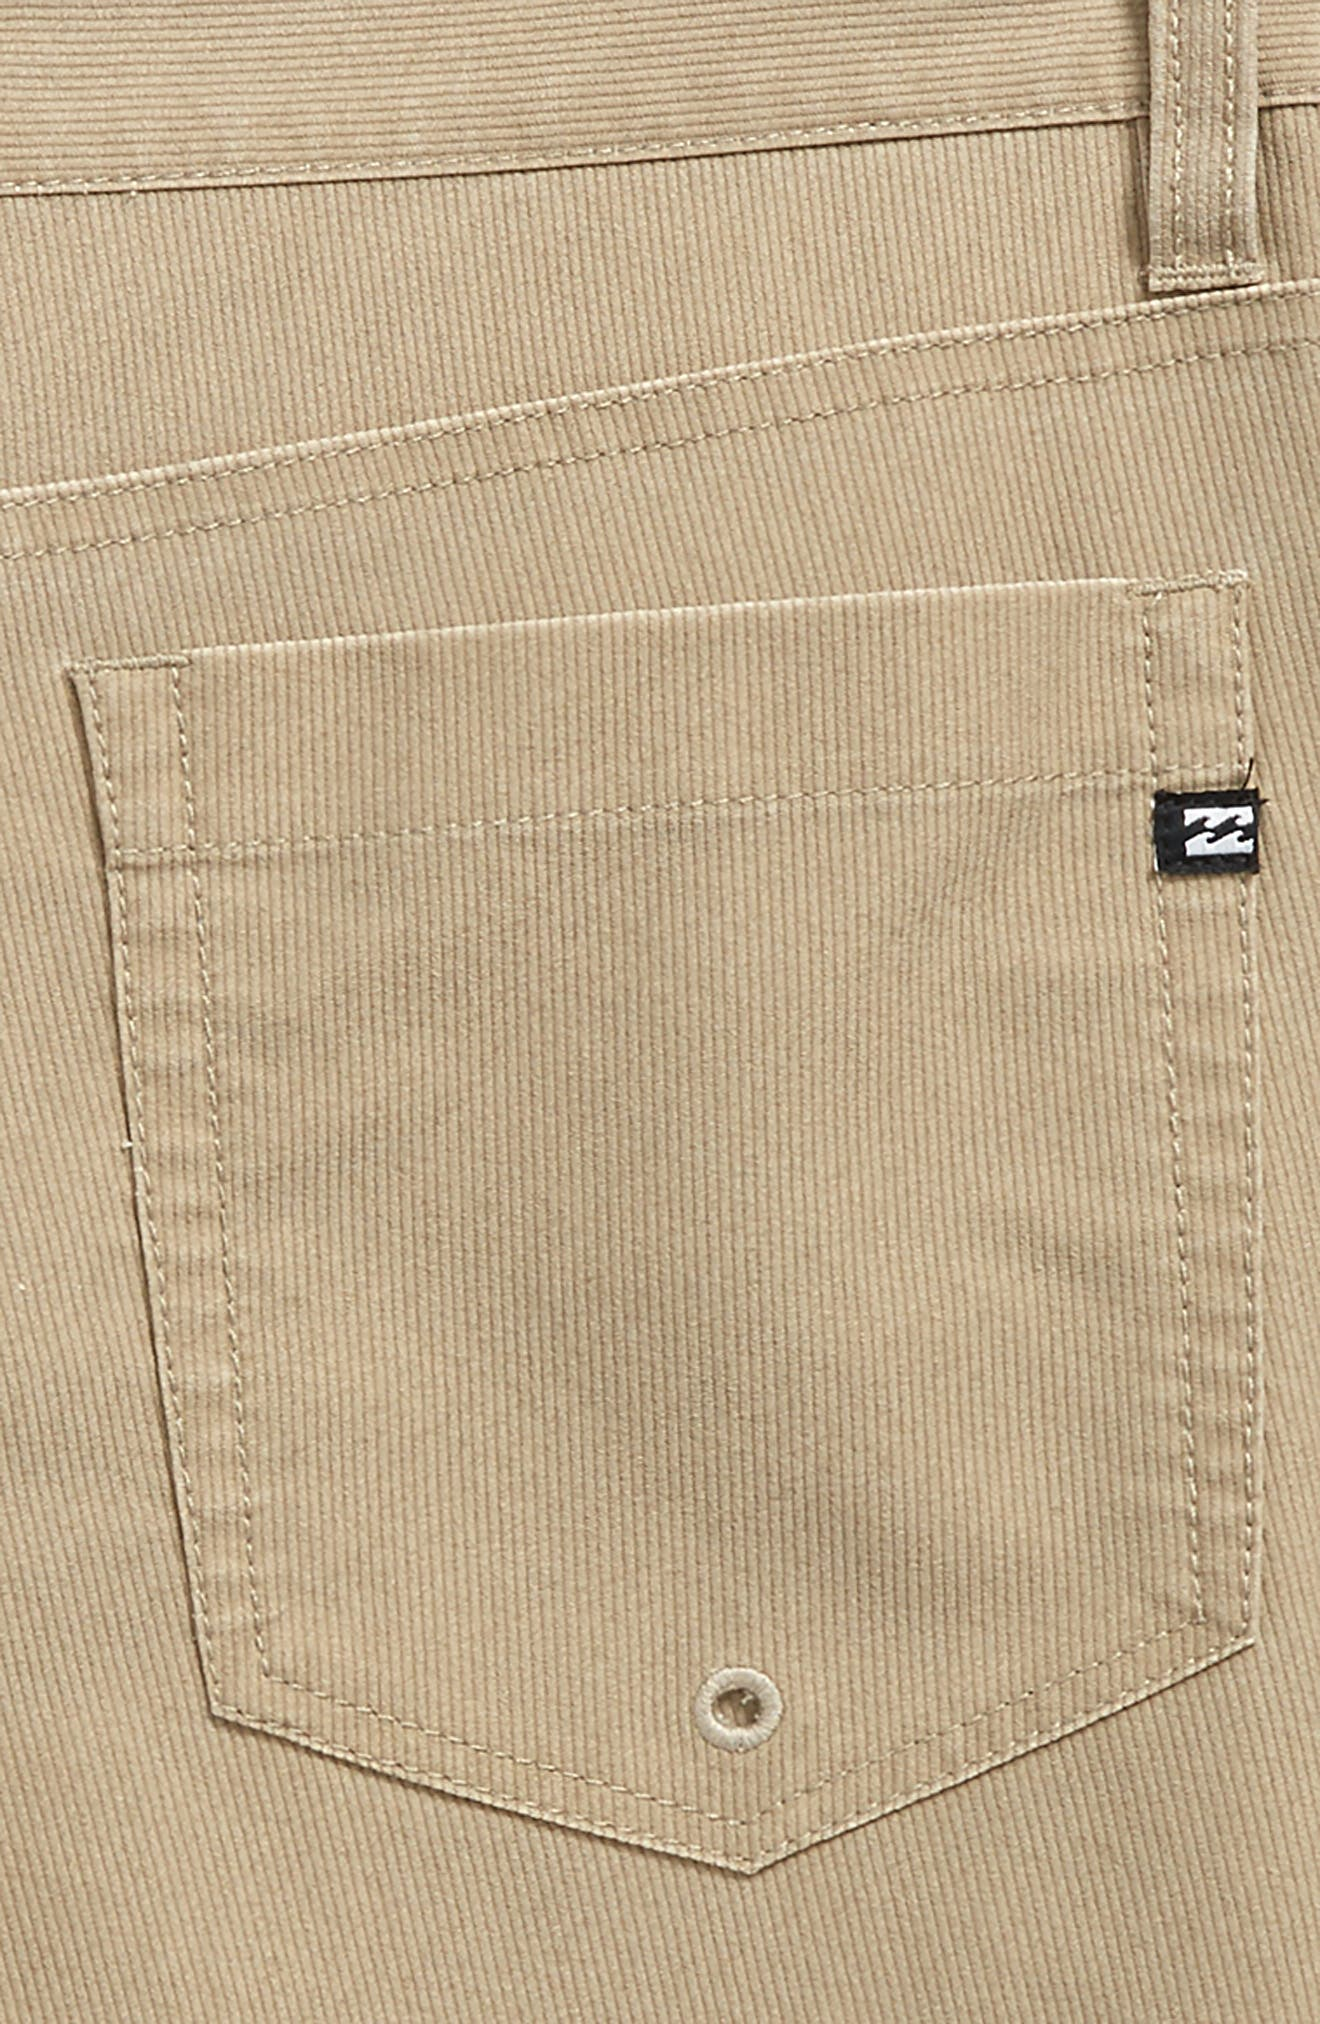 Outsider X Surf Corduroy Hybrid Shorts,                             Alternate thumbnail 3, color,                             Khaki